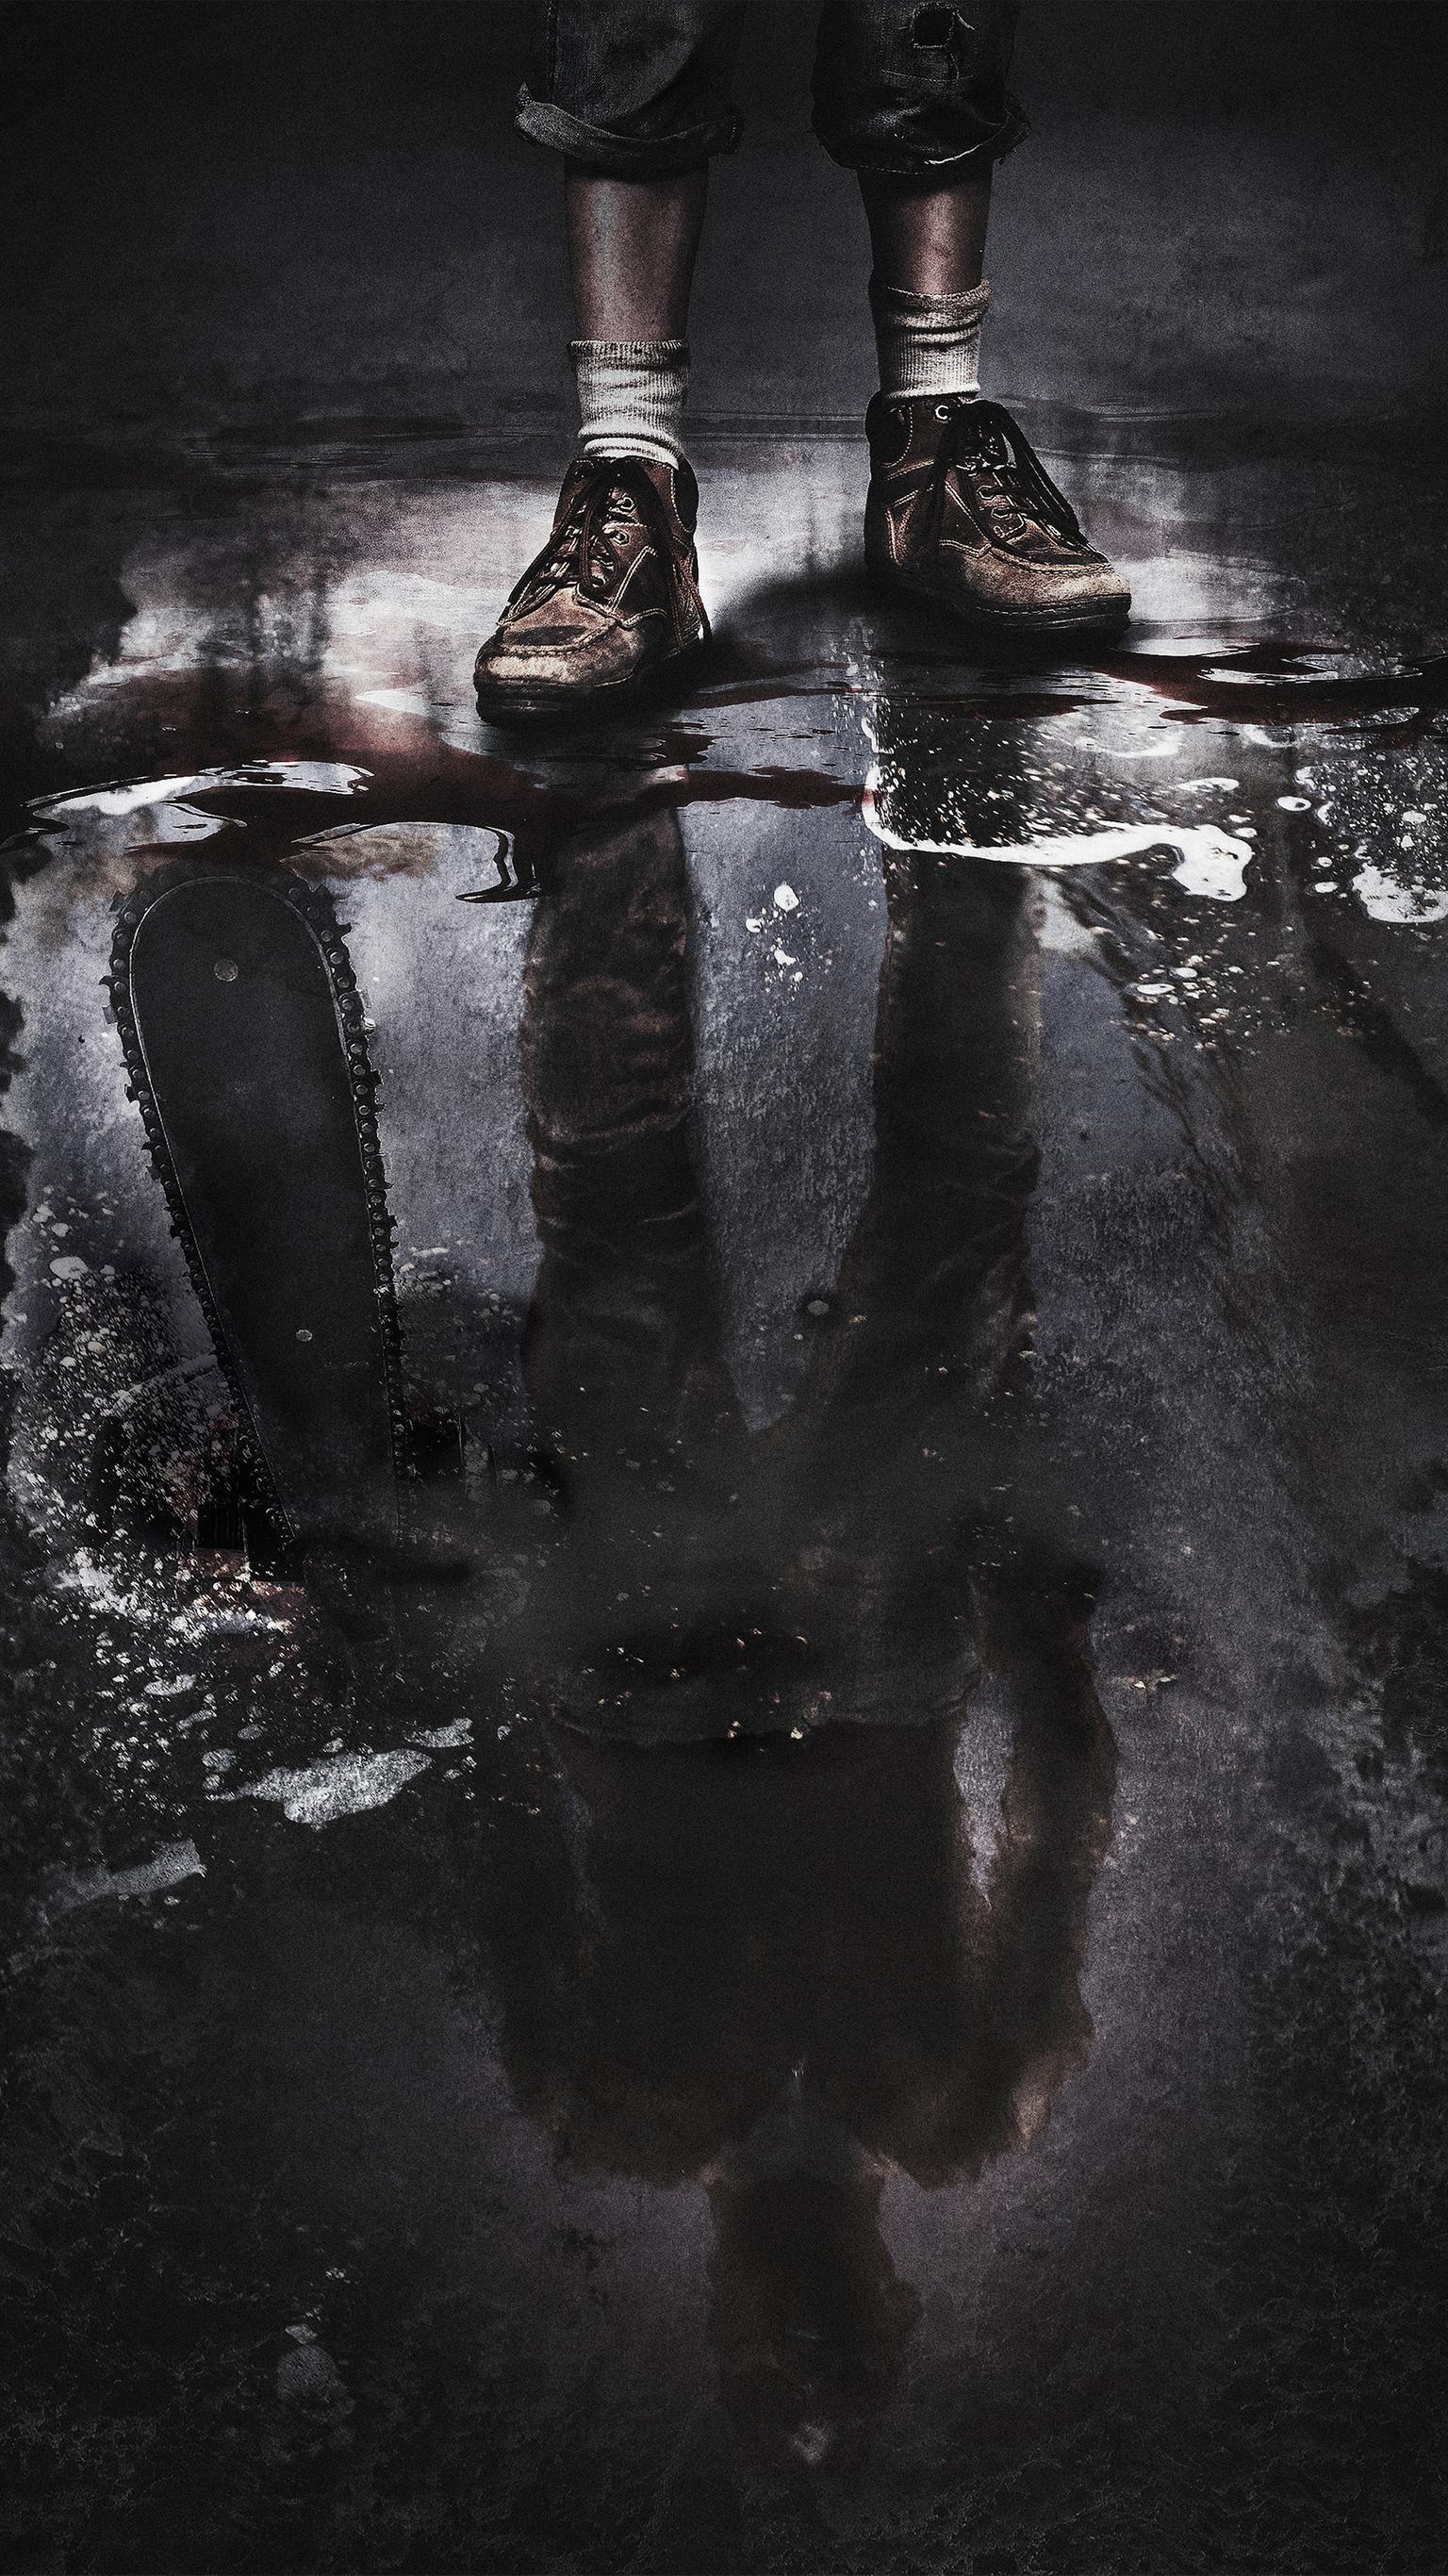 Leatherface 2017 Phone Wallpaper Moviemania Creepy Photography Zombie Wallpaper Horror Movie Icons